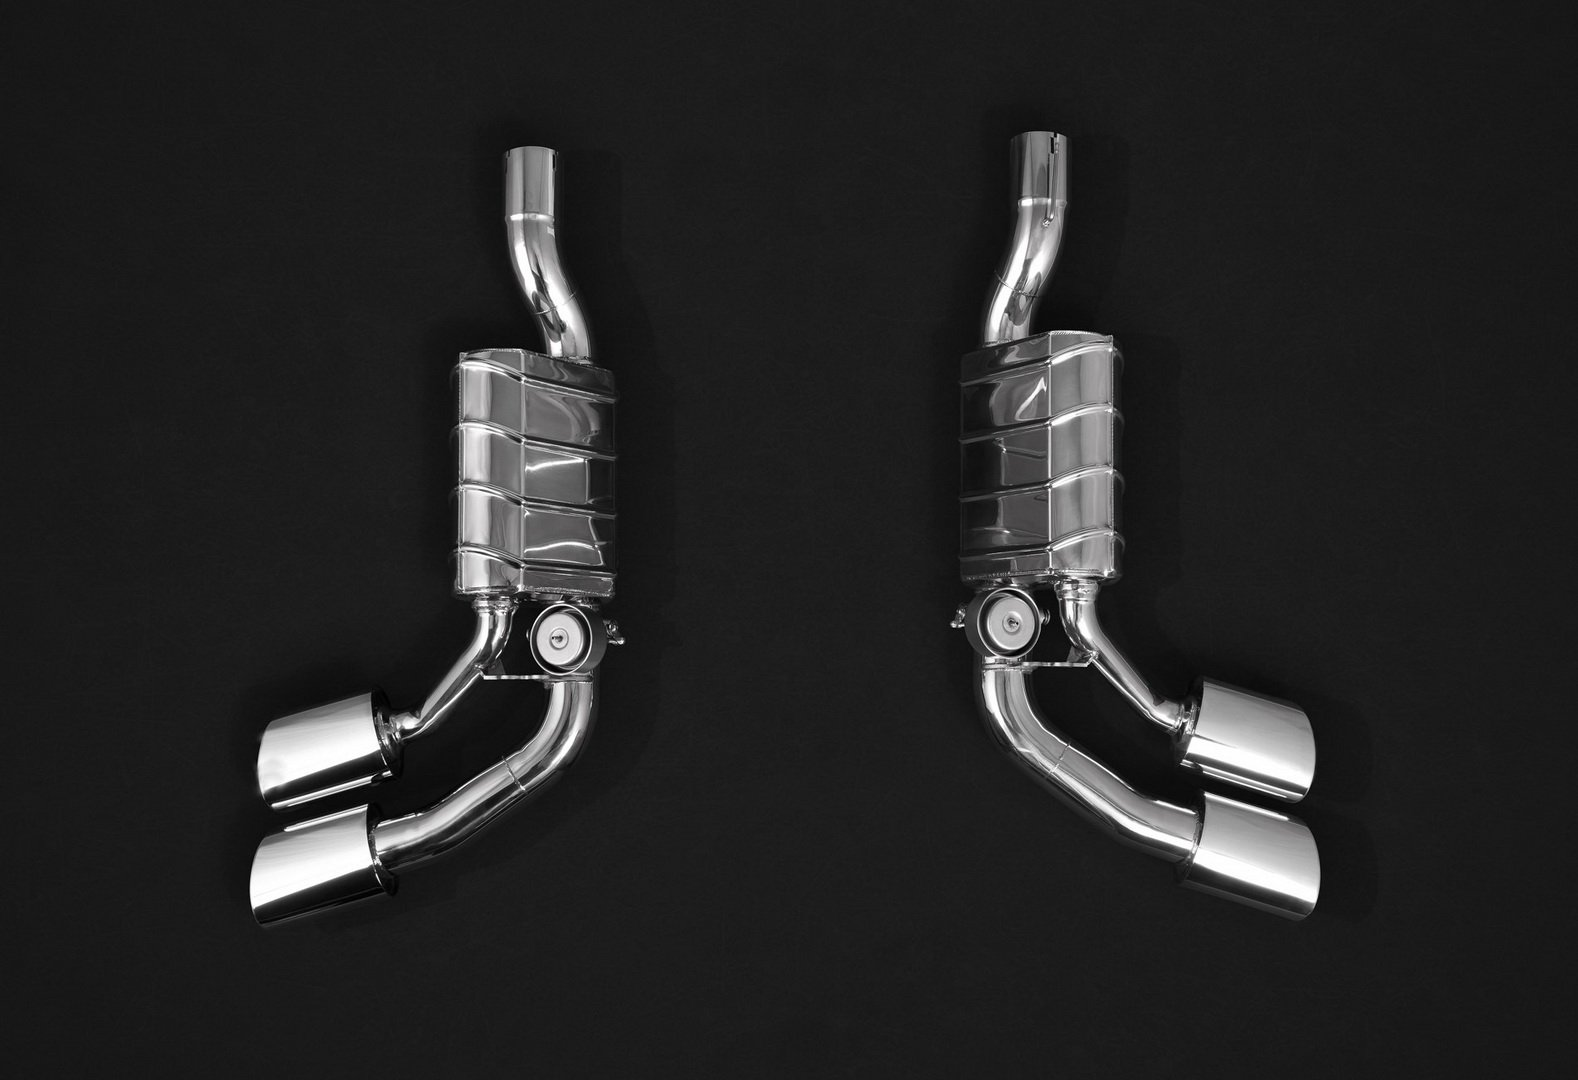 2019-mercedes-amg-g63-tuning-wheelsandmore-7.jpg